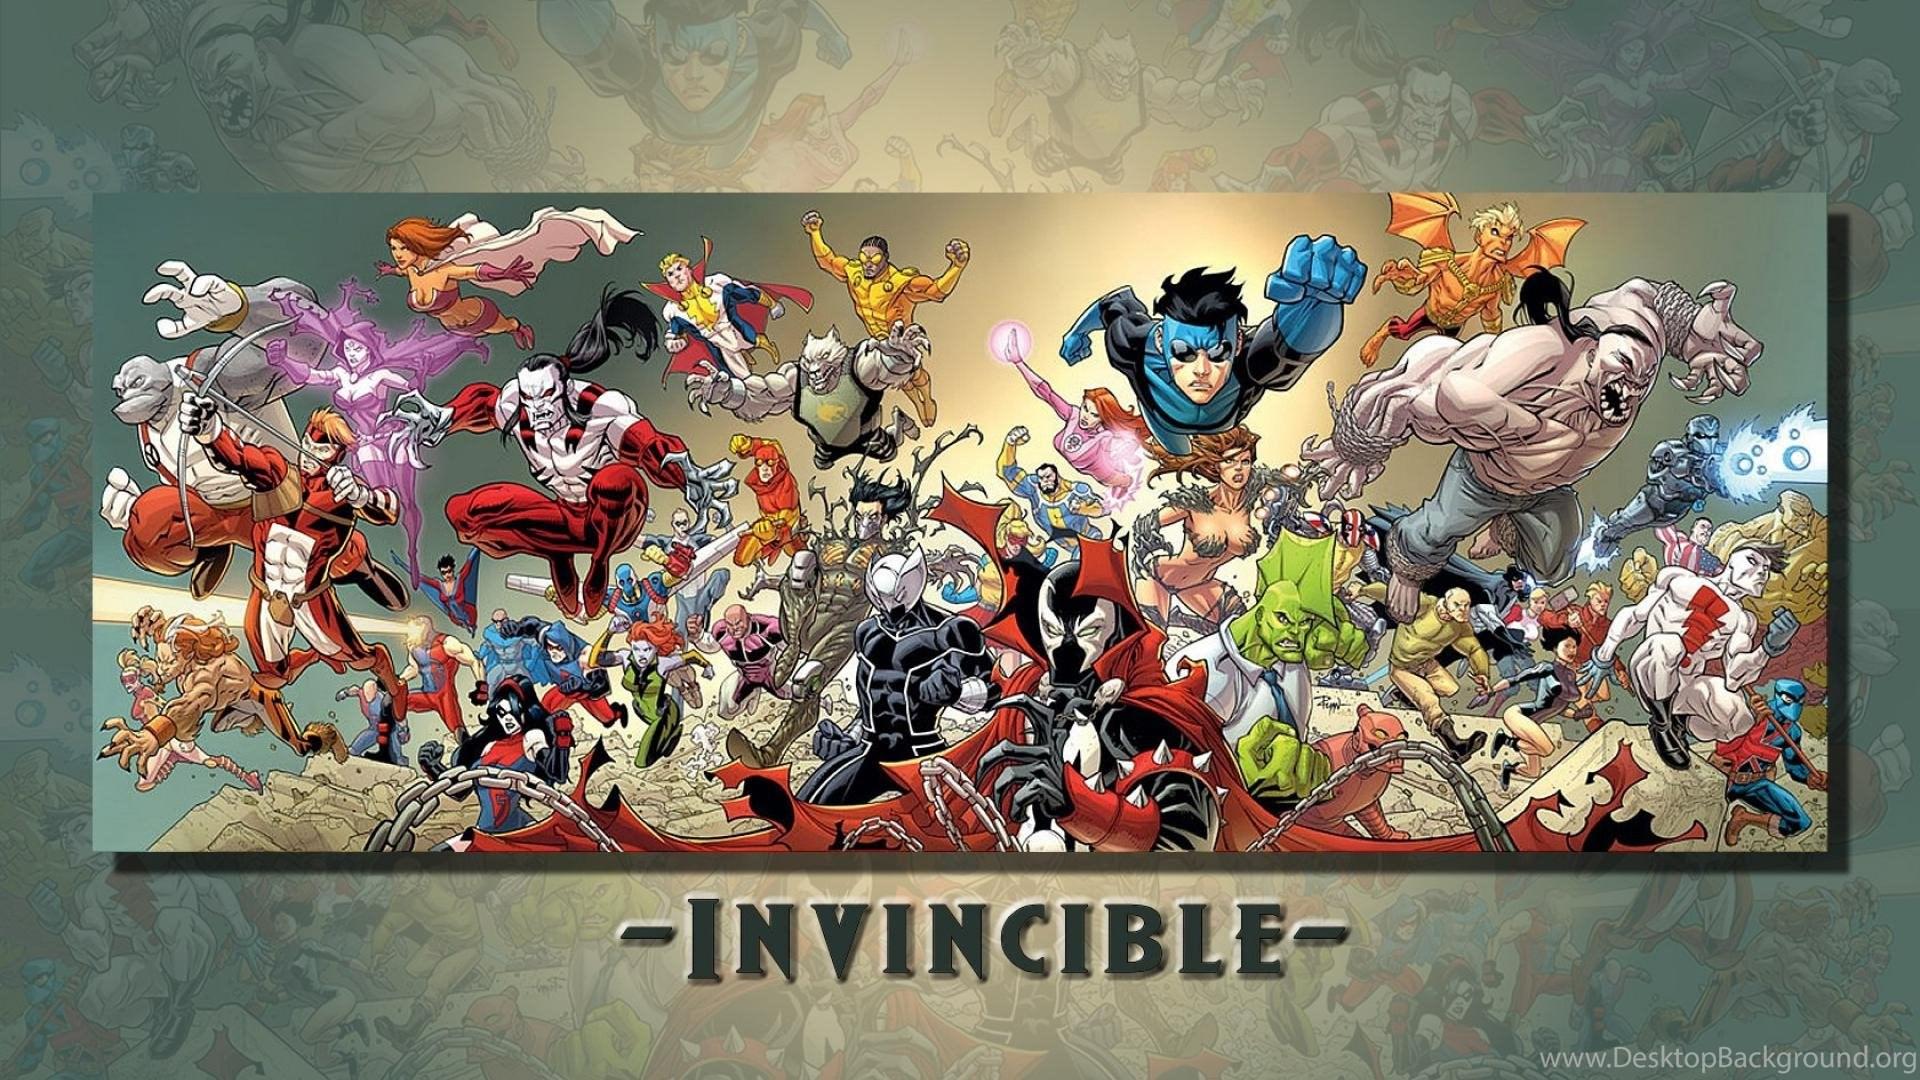 Invincible Comics Cartoon HD Wallpapers Desktop Background